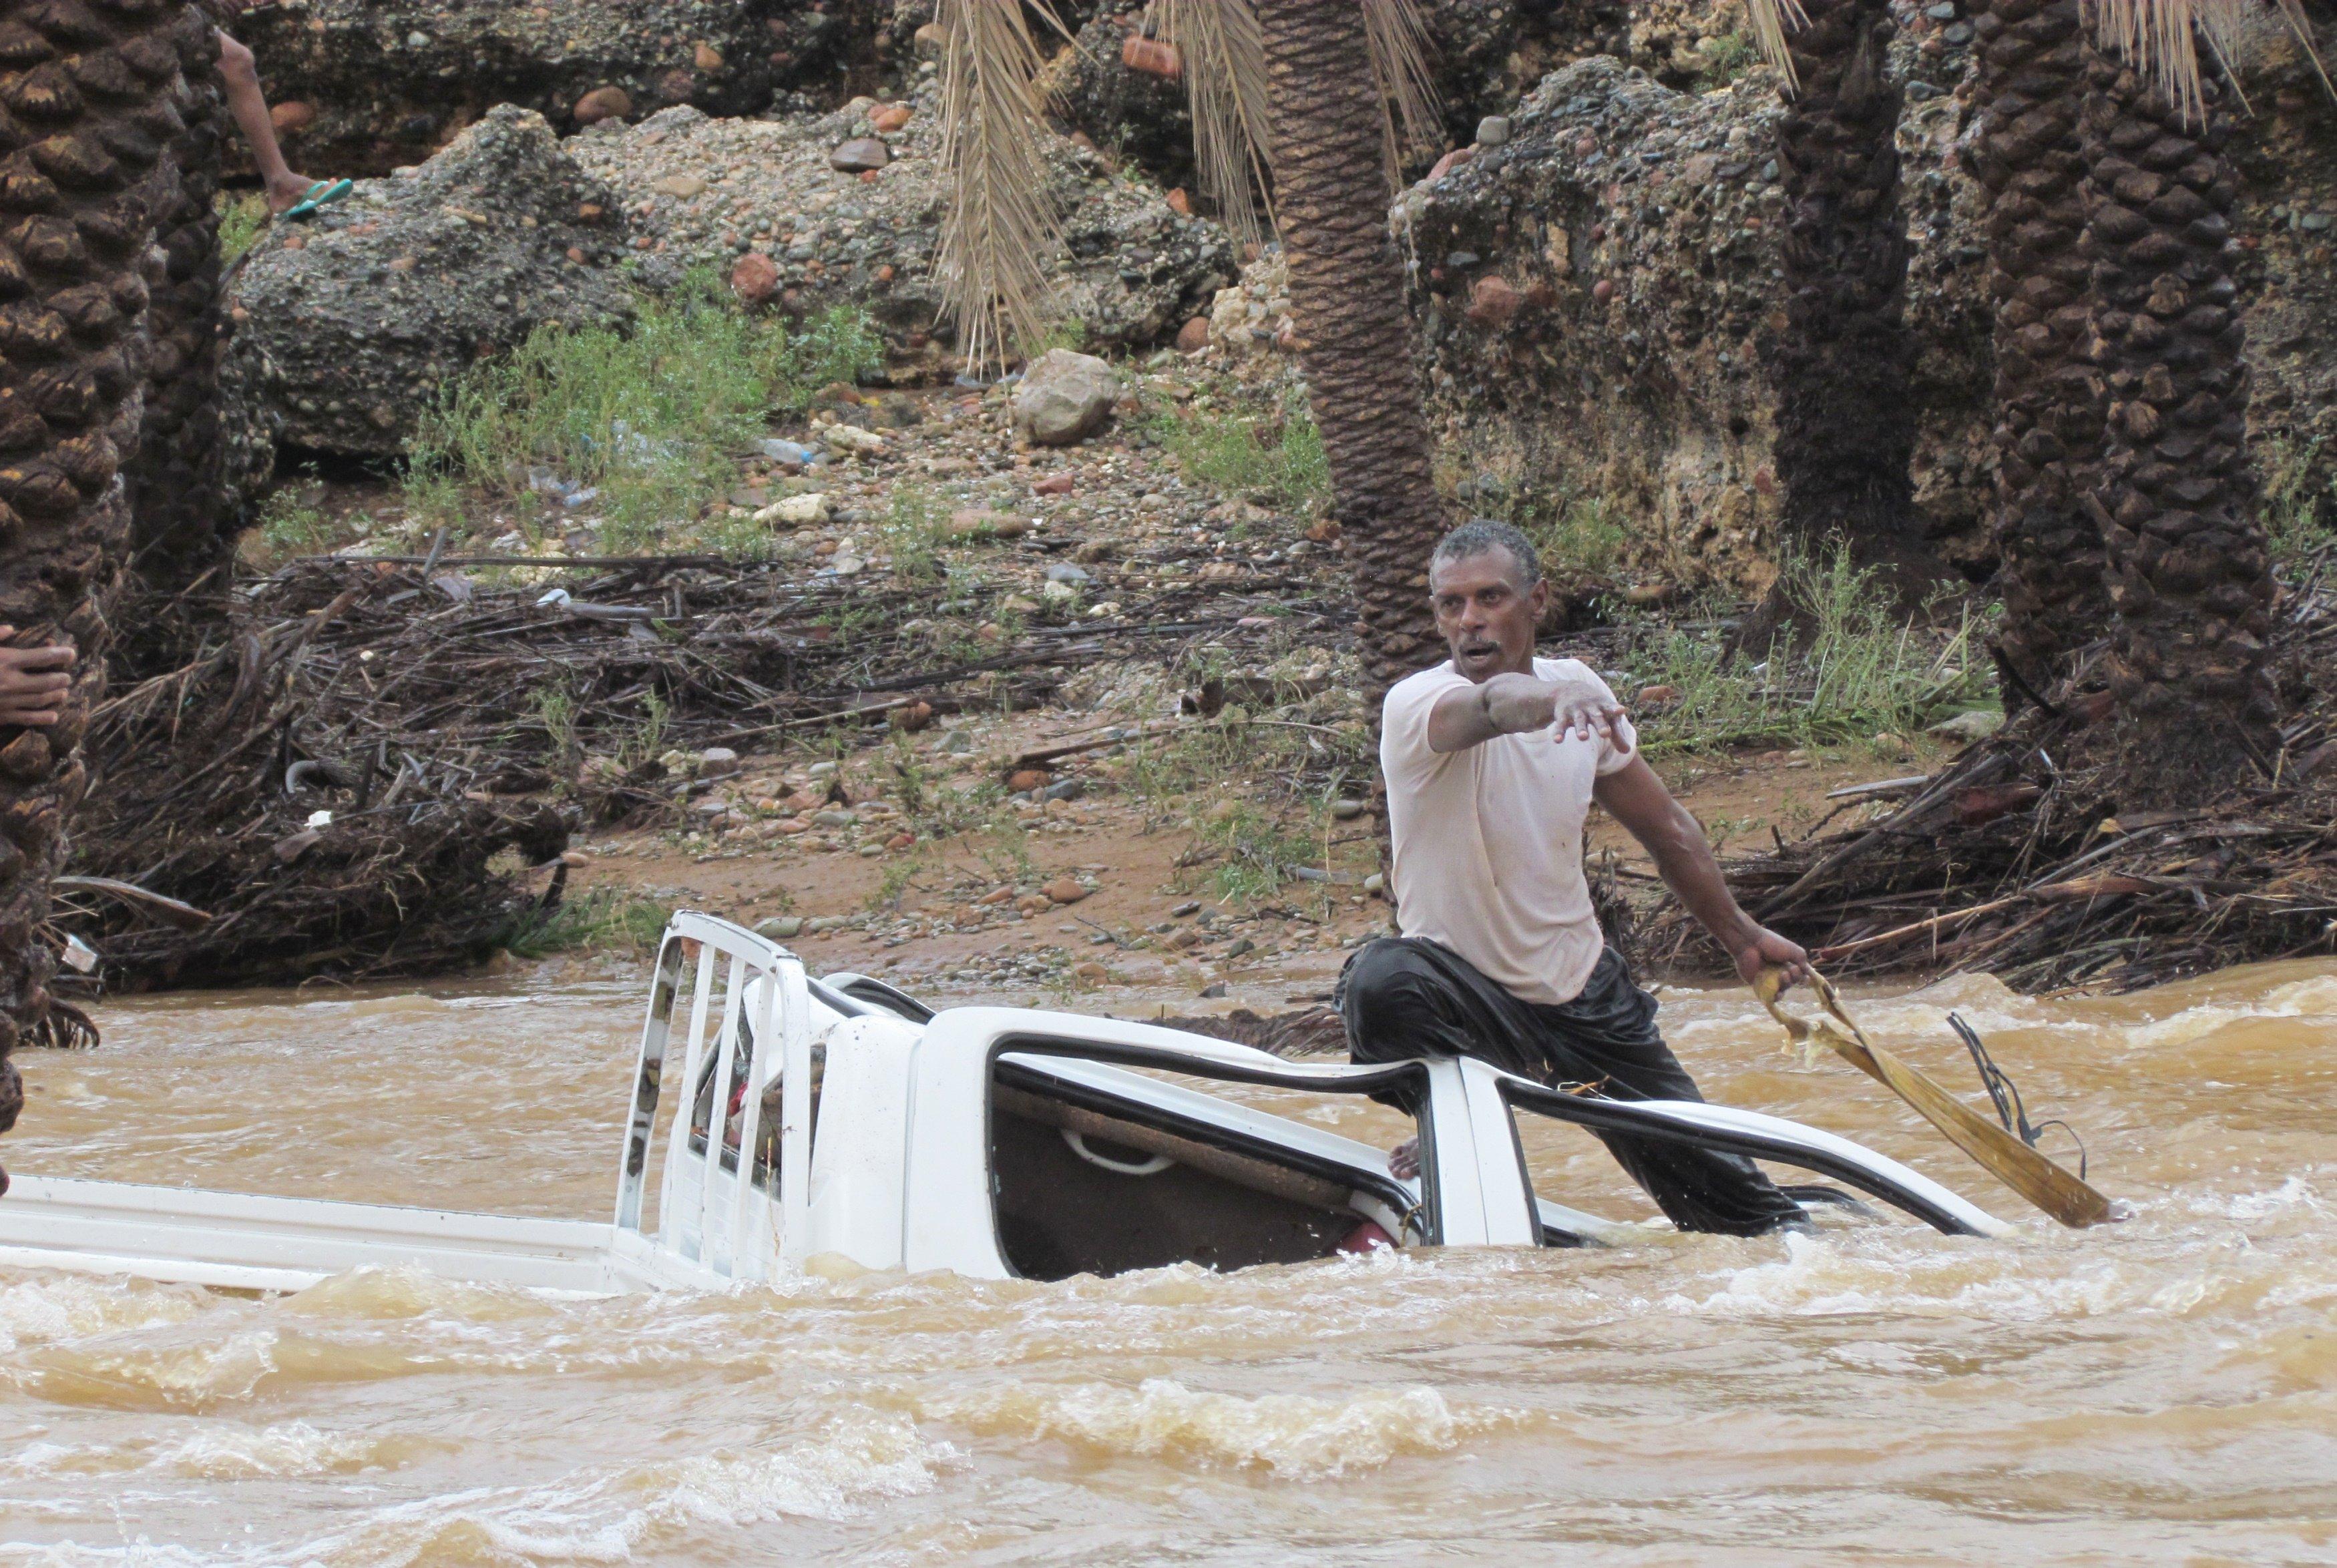 Seorang pria naik ke atap mobil saat mencoba menarik kendaraan yang terseret arus banjir di pulau Socotra Yaman, Senin (2/11). Siklon tropis langka yang menyebabkan badai angin yang menewaskan tiga orang dan melukai puluhan lainnya di pulau Socotra Yaman pada hari Senin, menurut warga dan pejabat. REUTERS.